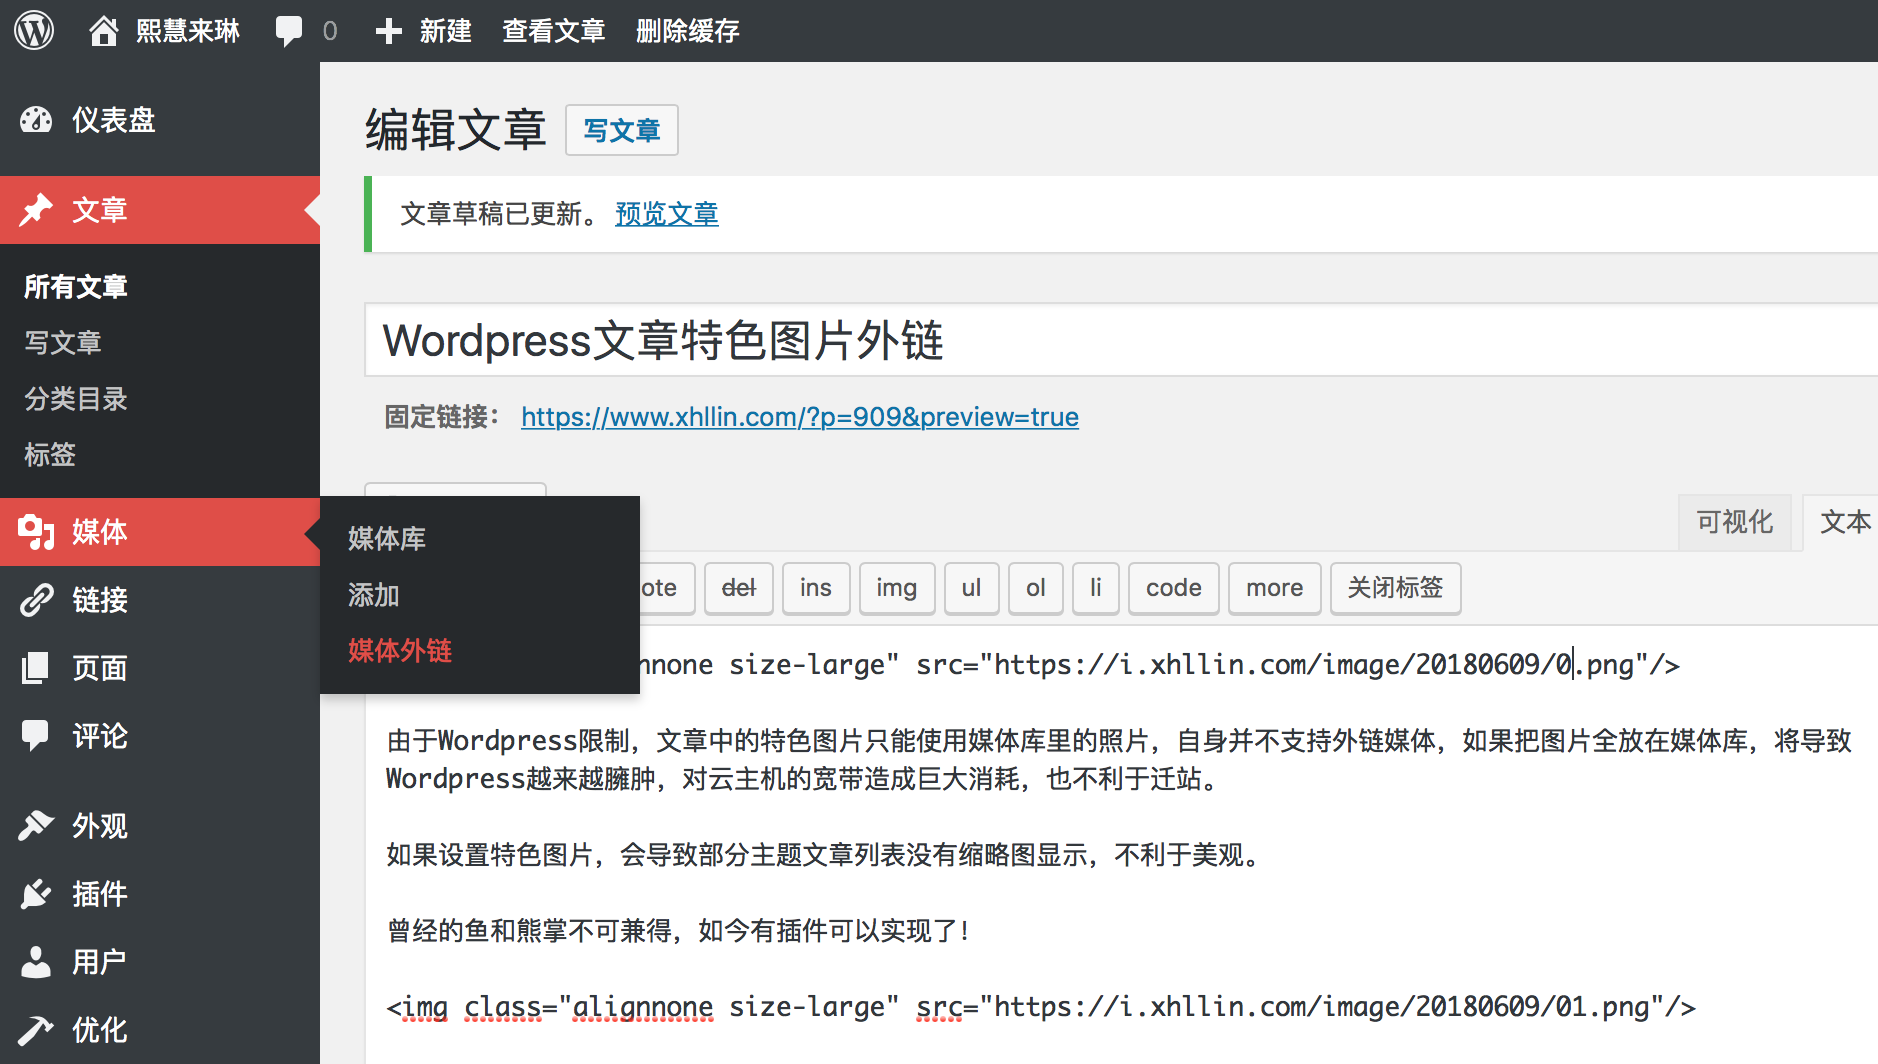 《Wordpress文章特色图片外链》